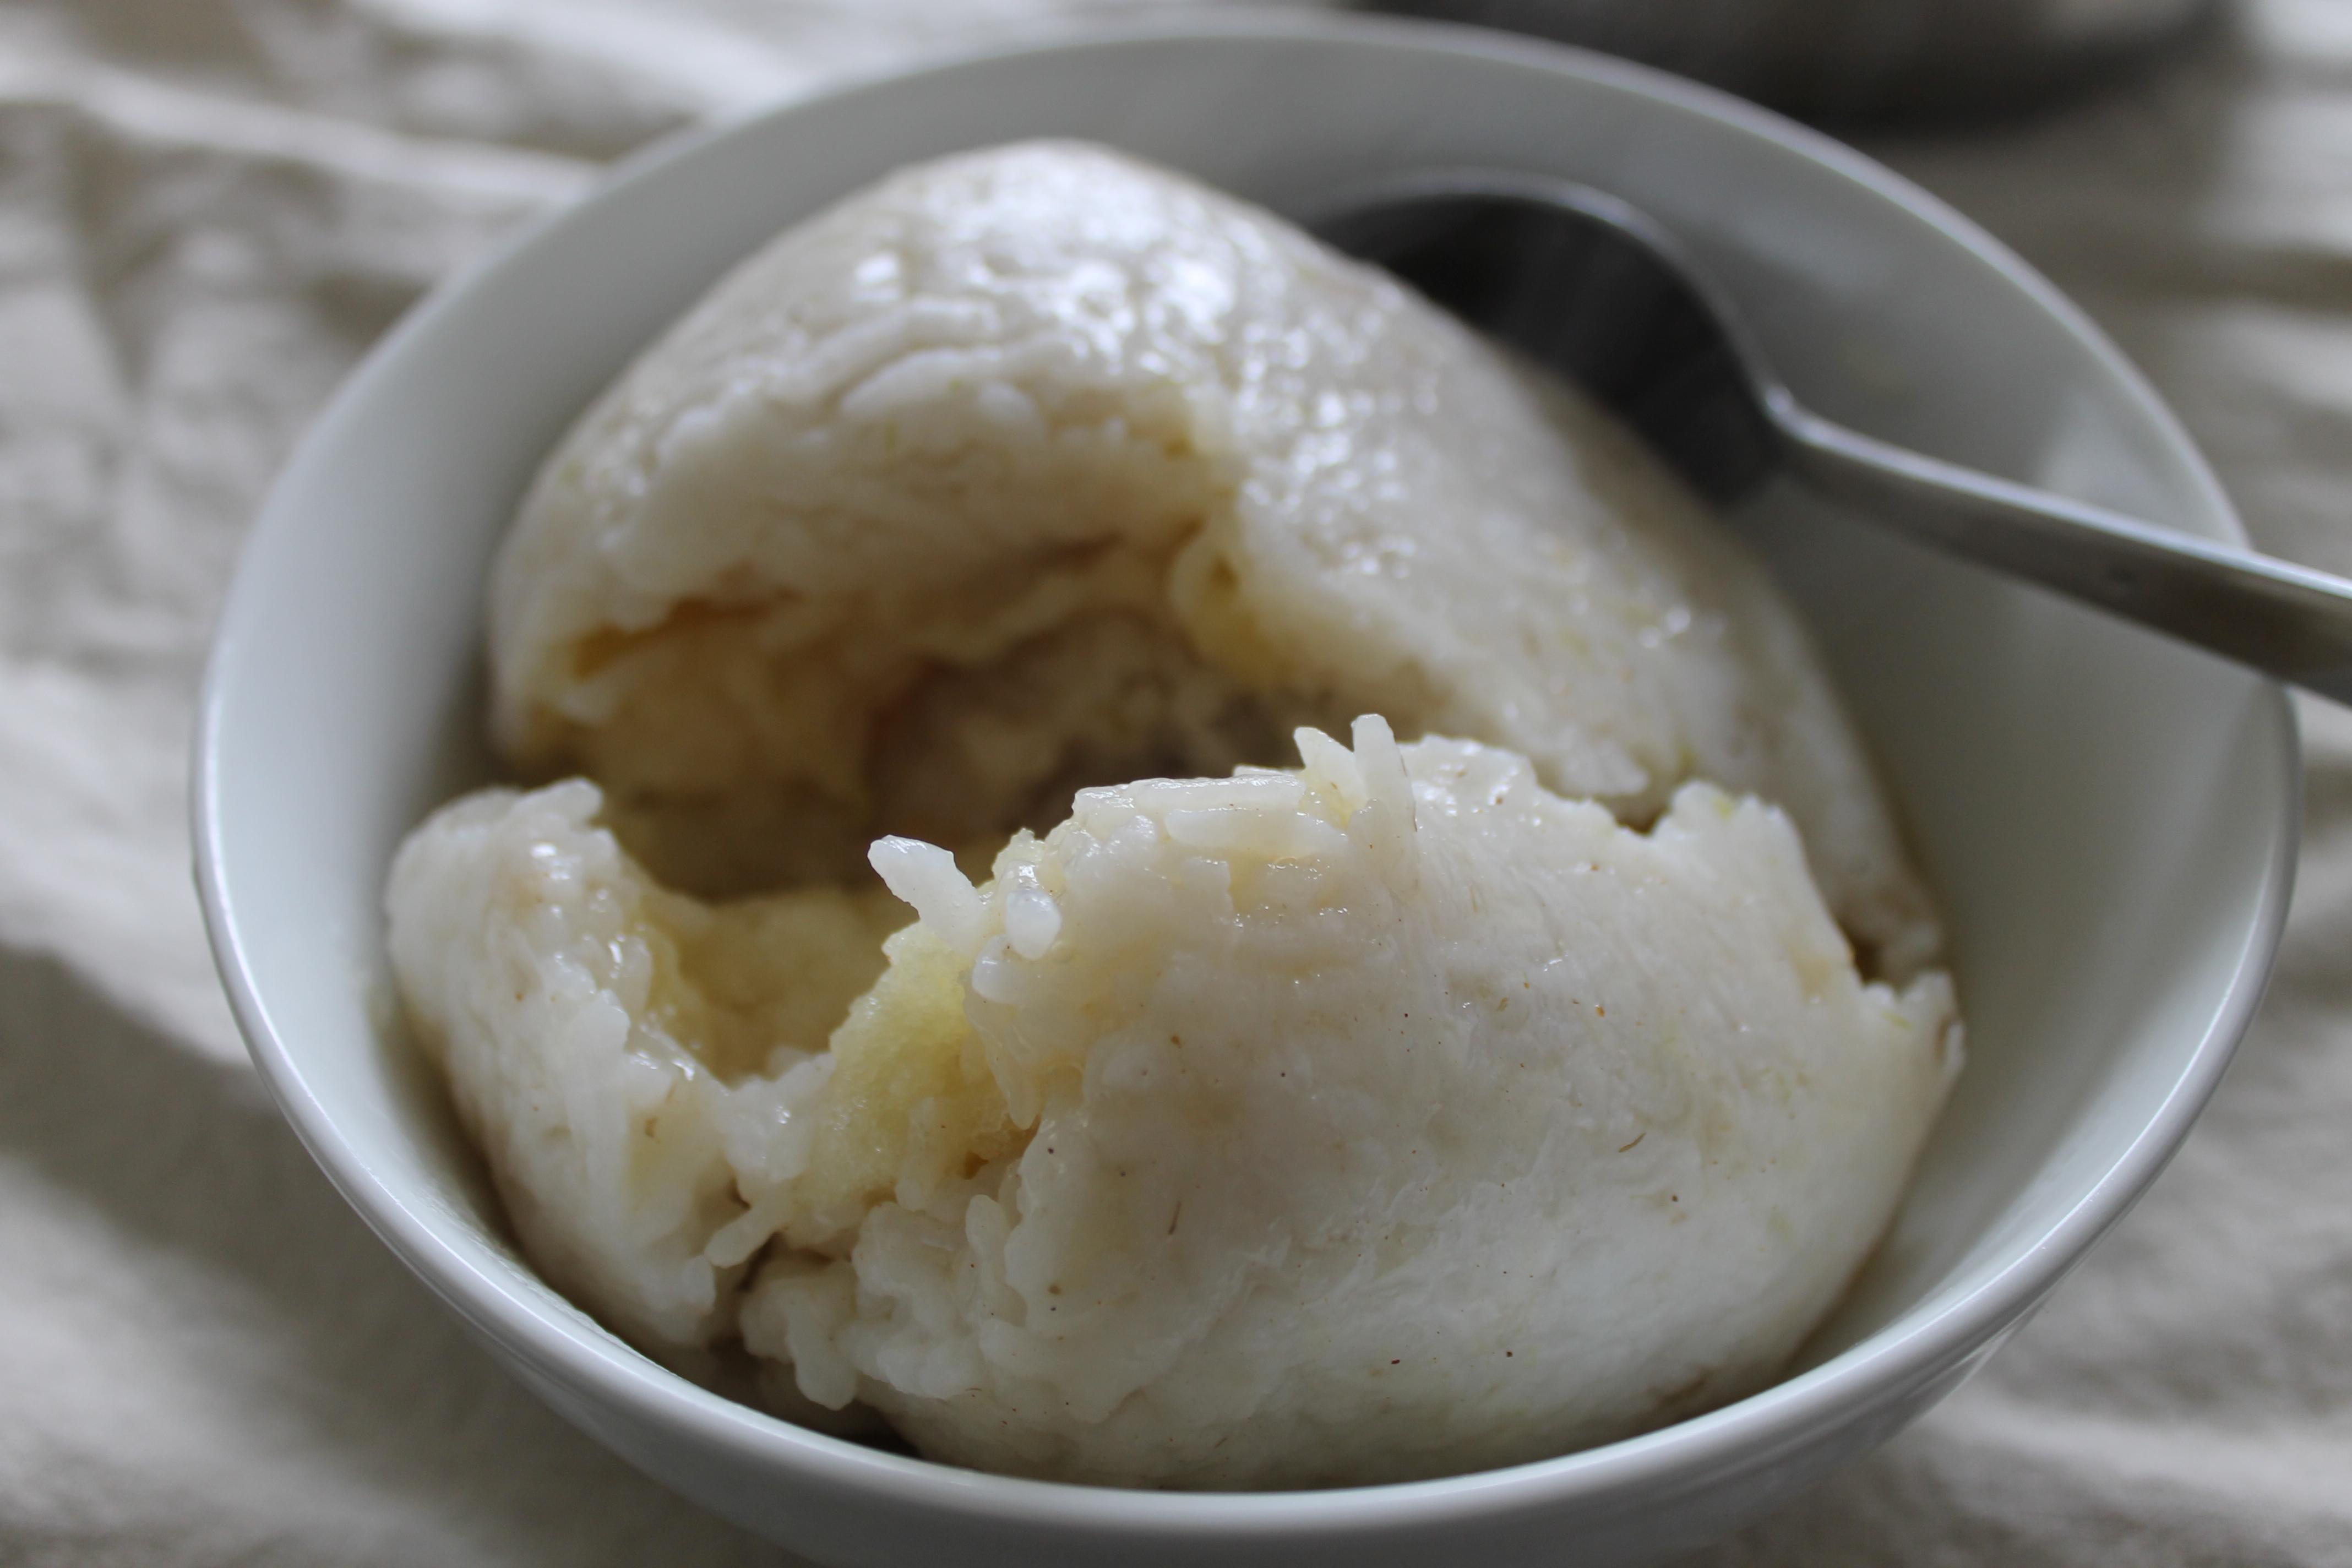 Carolina Snowballs, recipe from 1858